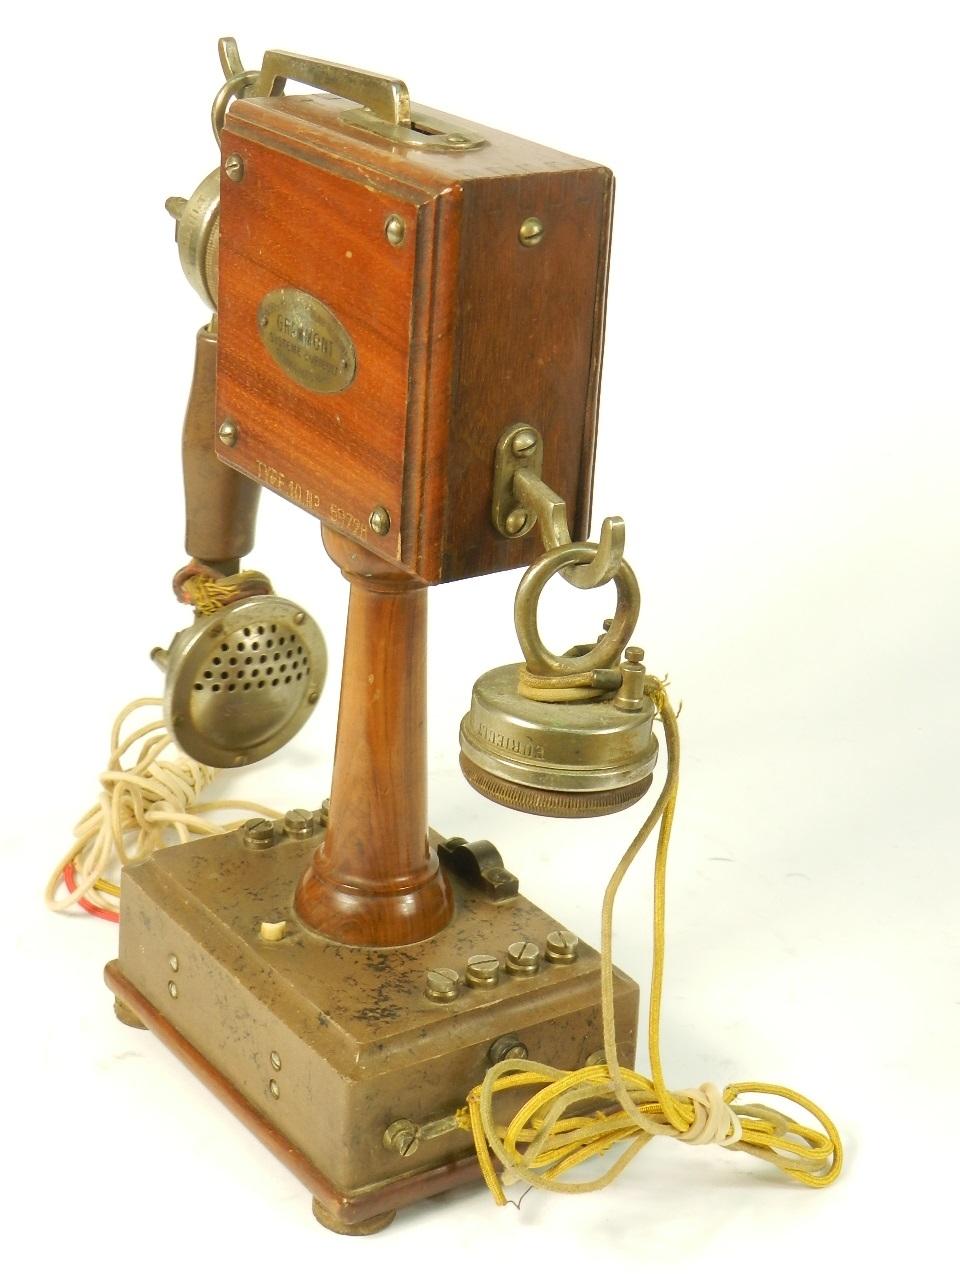 Imagen TELEFONO GRAMMONT TYPE Nº10 1915 38747